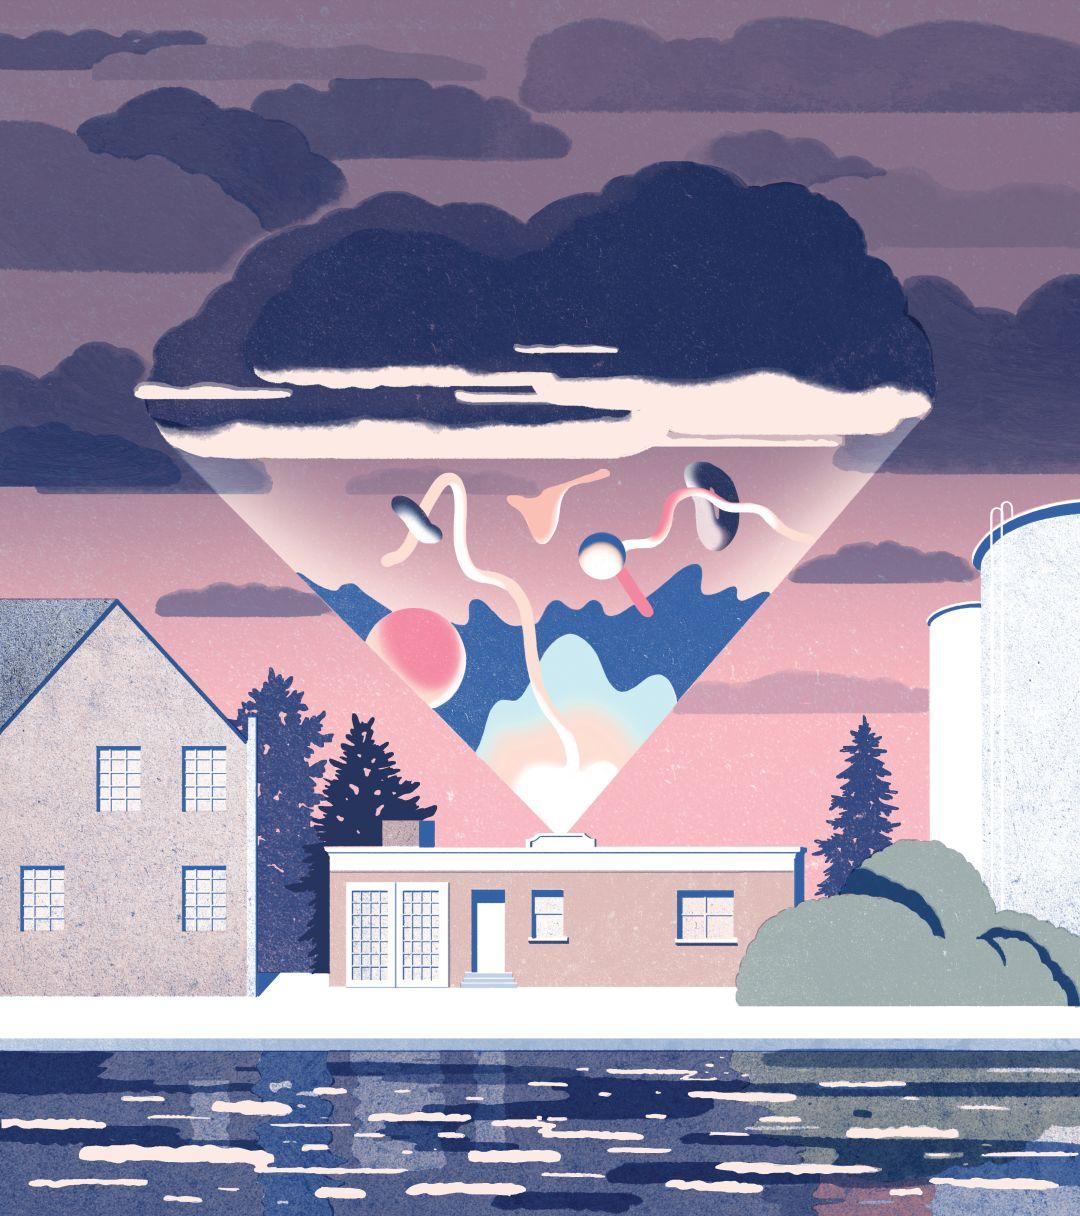 1017 arts boathouse microcinema famj4a